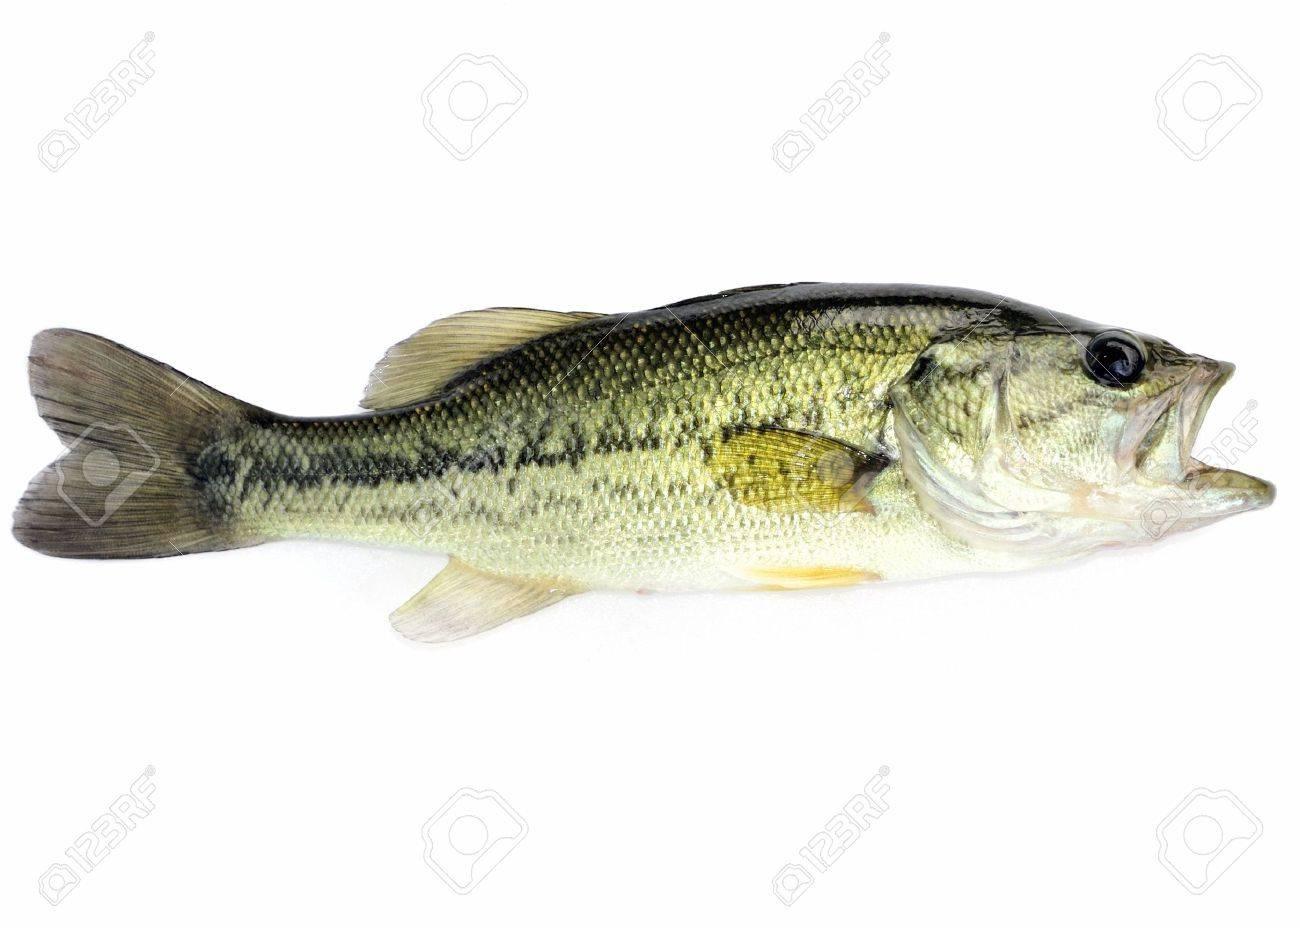 A young  fresh water largemouth bass. Stock Photo - 7141952